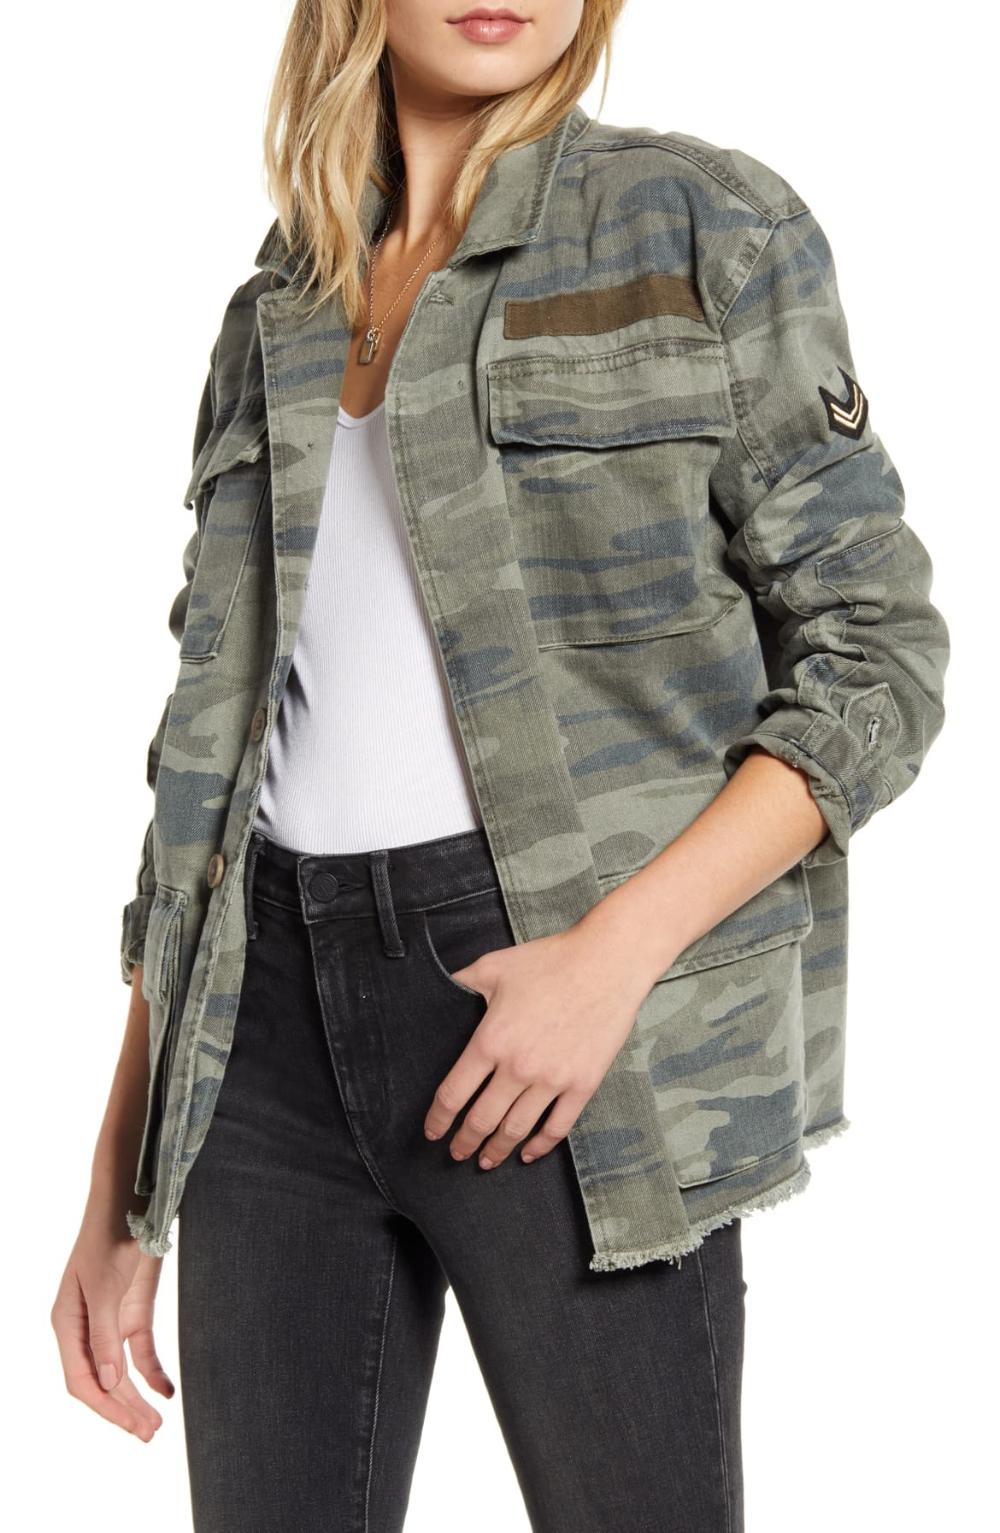 Treasure Bond Patch Detail Camo Cotton Jacket Nordstrom Denim Jacket Patches Cotton Jacket Denim Jacket Fashion [ 1533 x 1000 Pixel ]